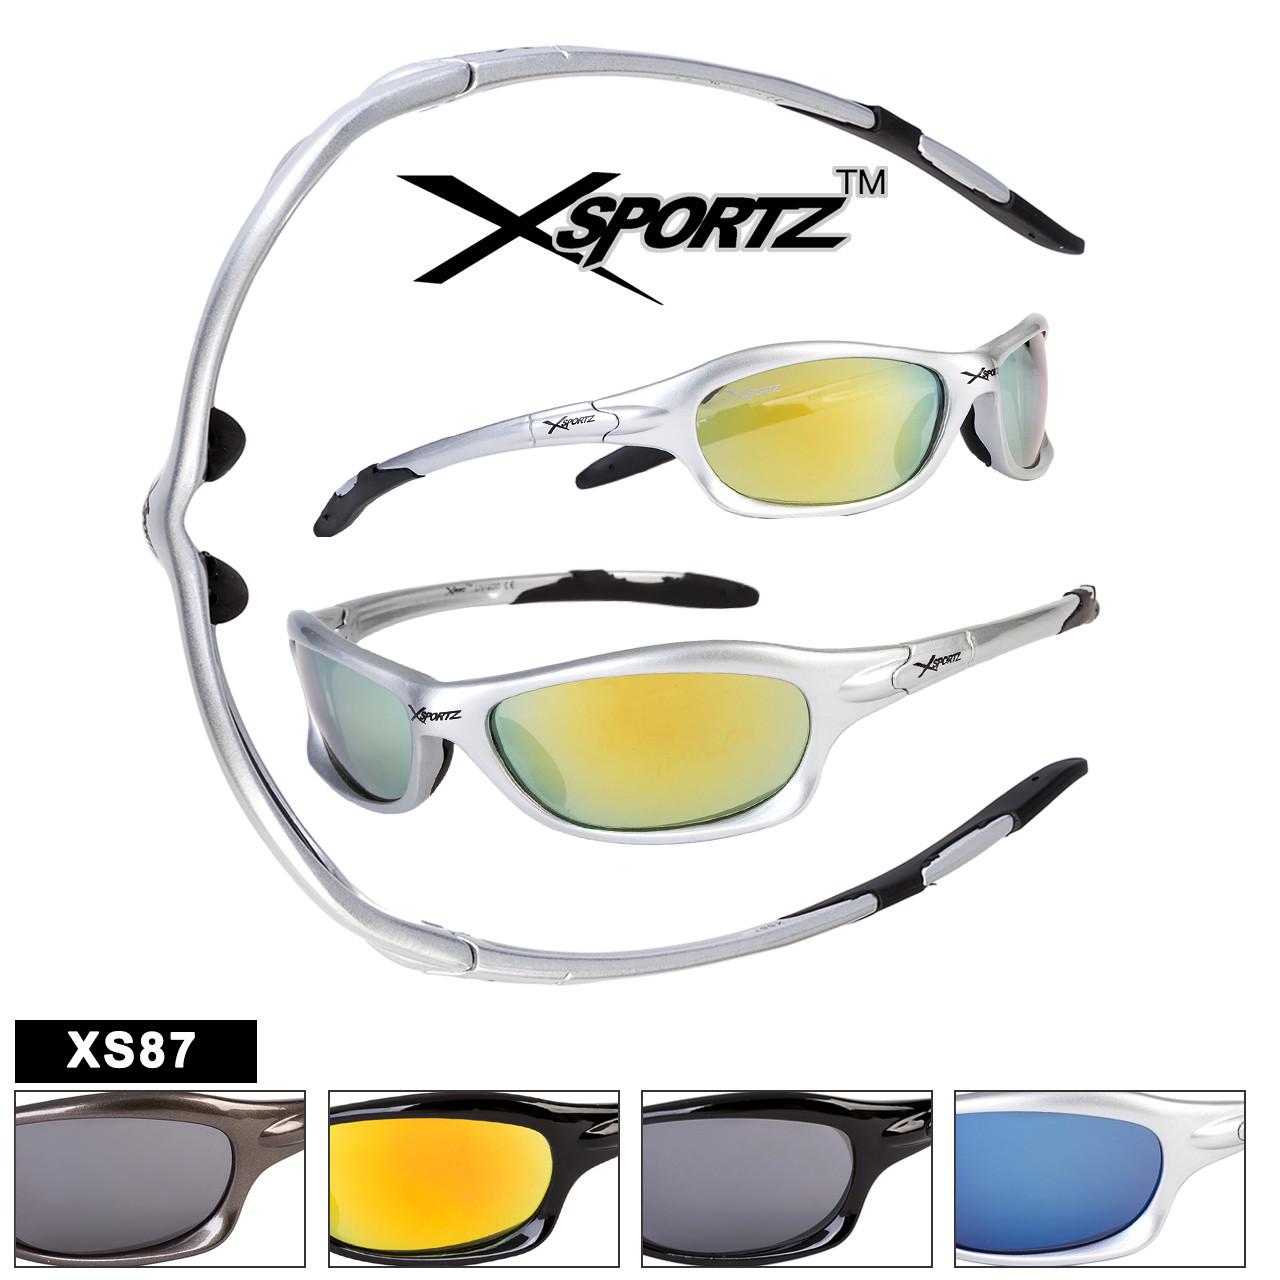 Xsportz Wholesale Sport Sunglasses XS87